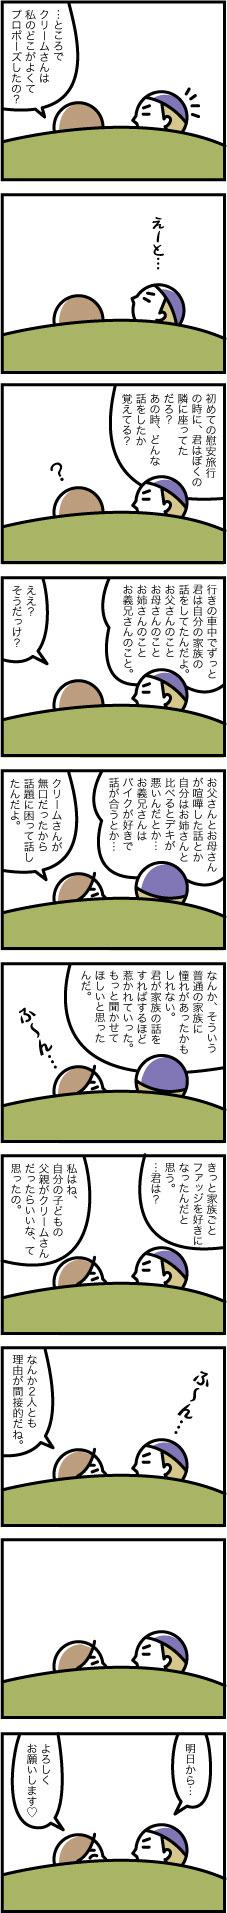 ep11-2